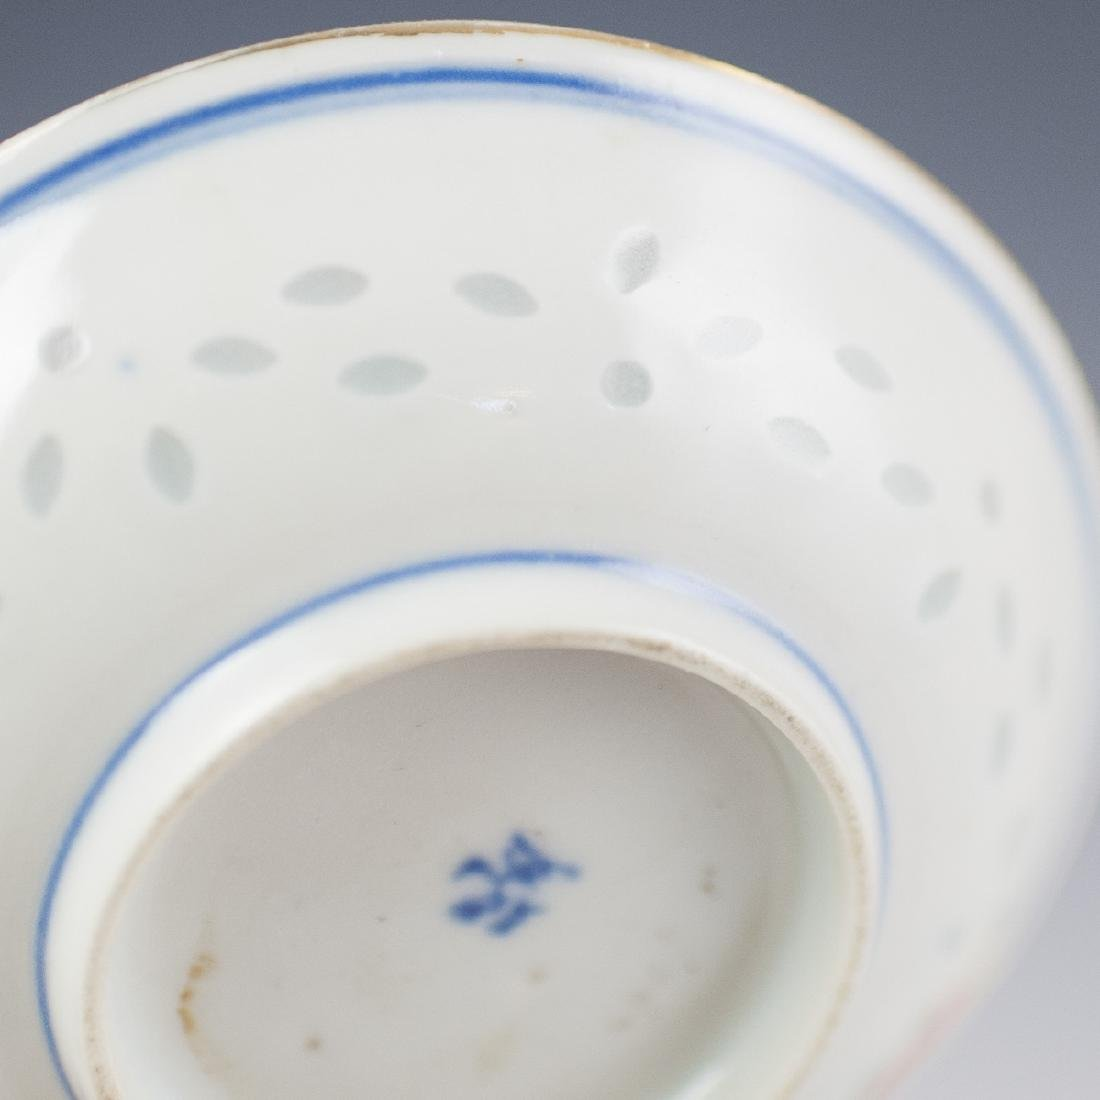 Chinese Porcelain De Riz Ware Demitasse Set - 6